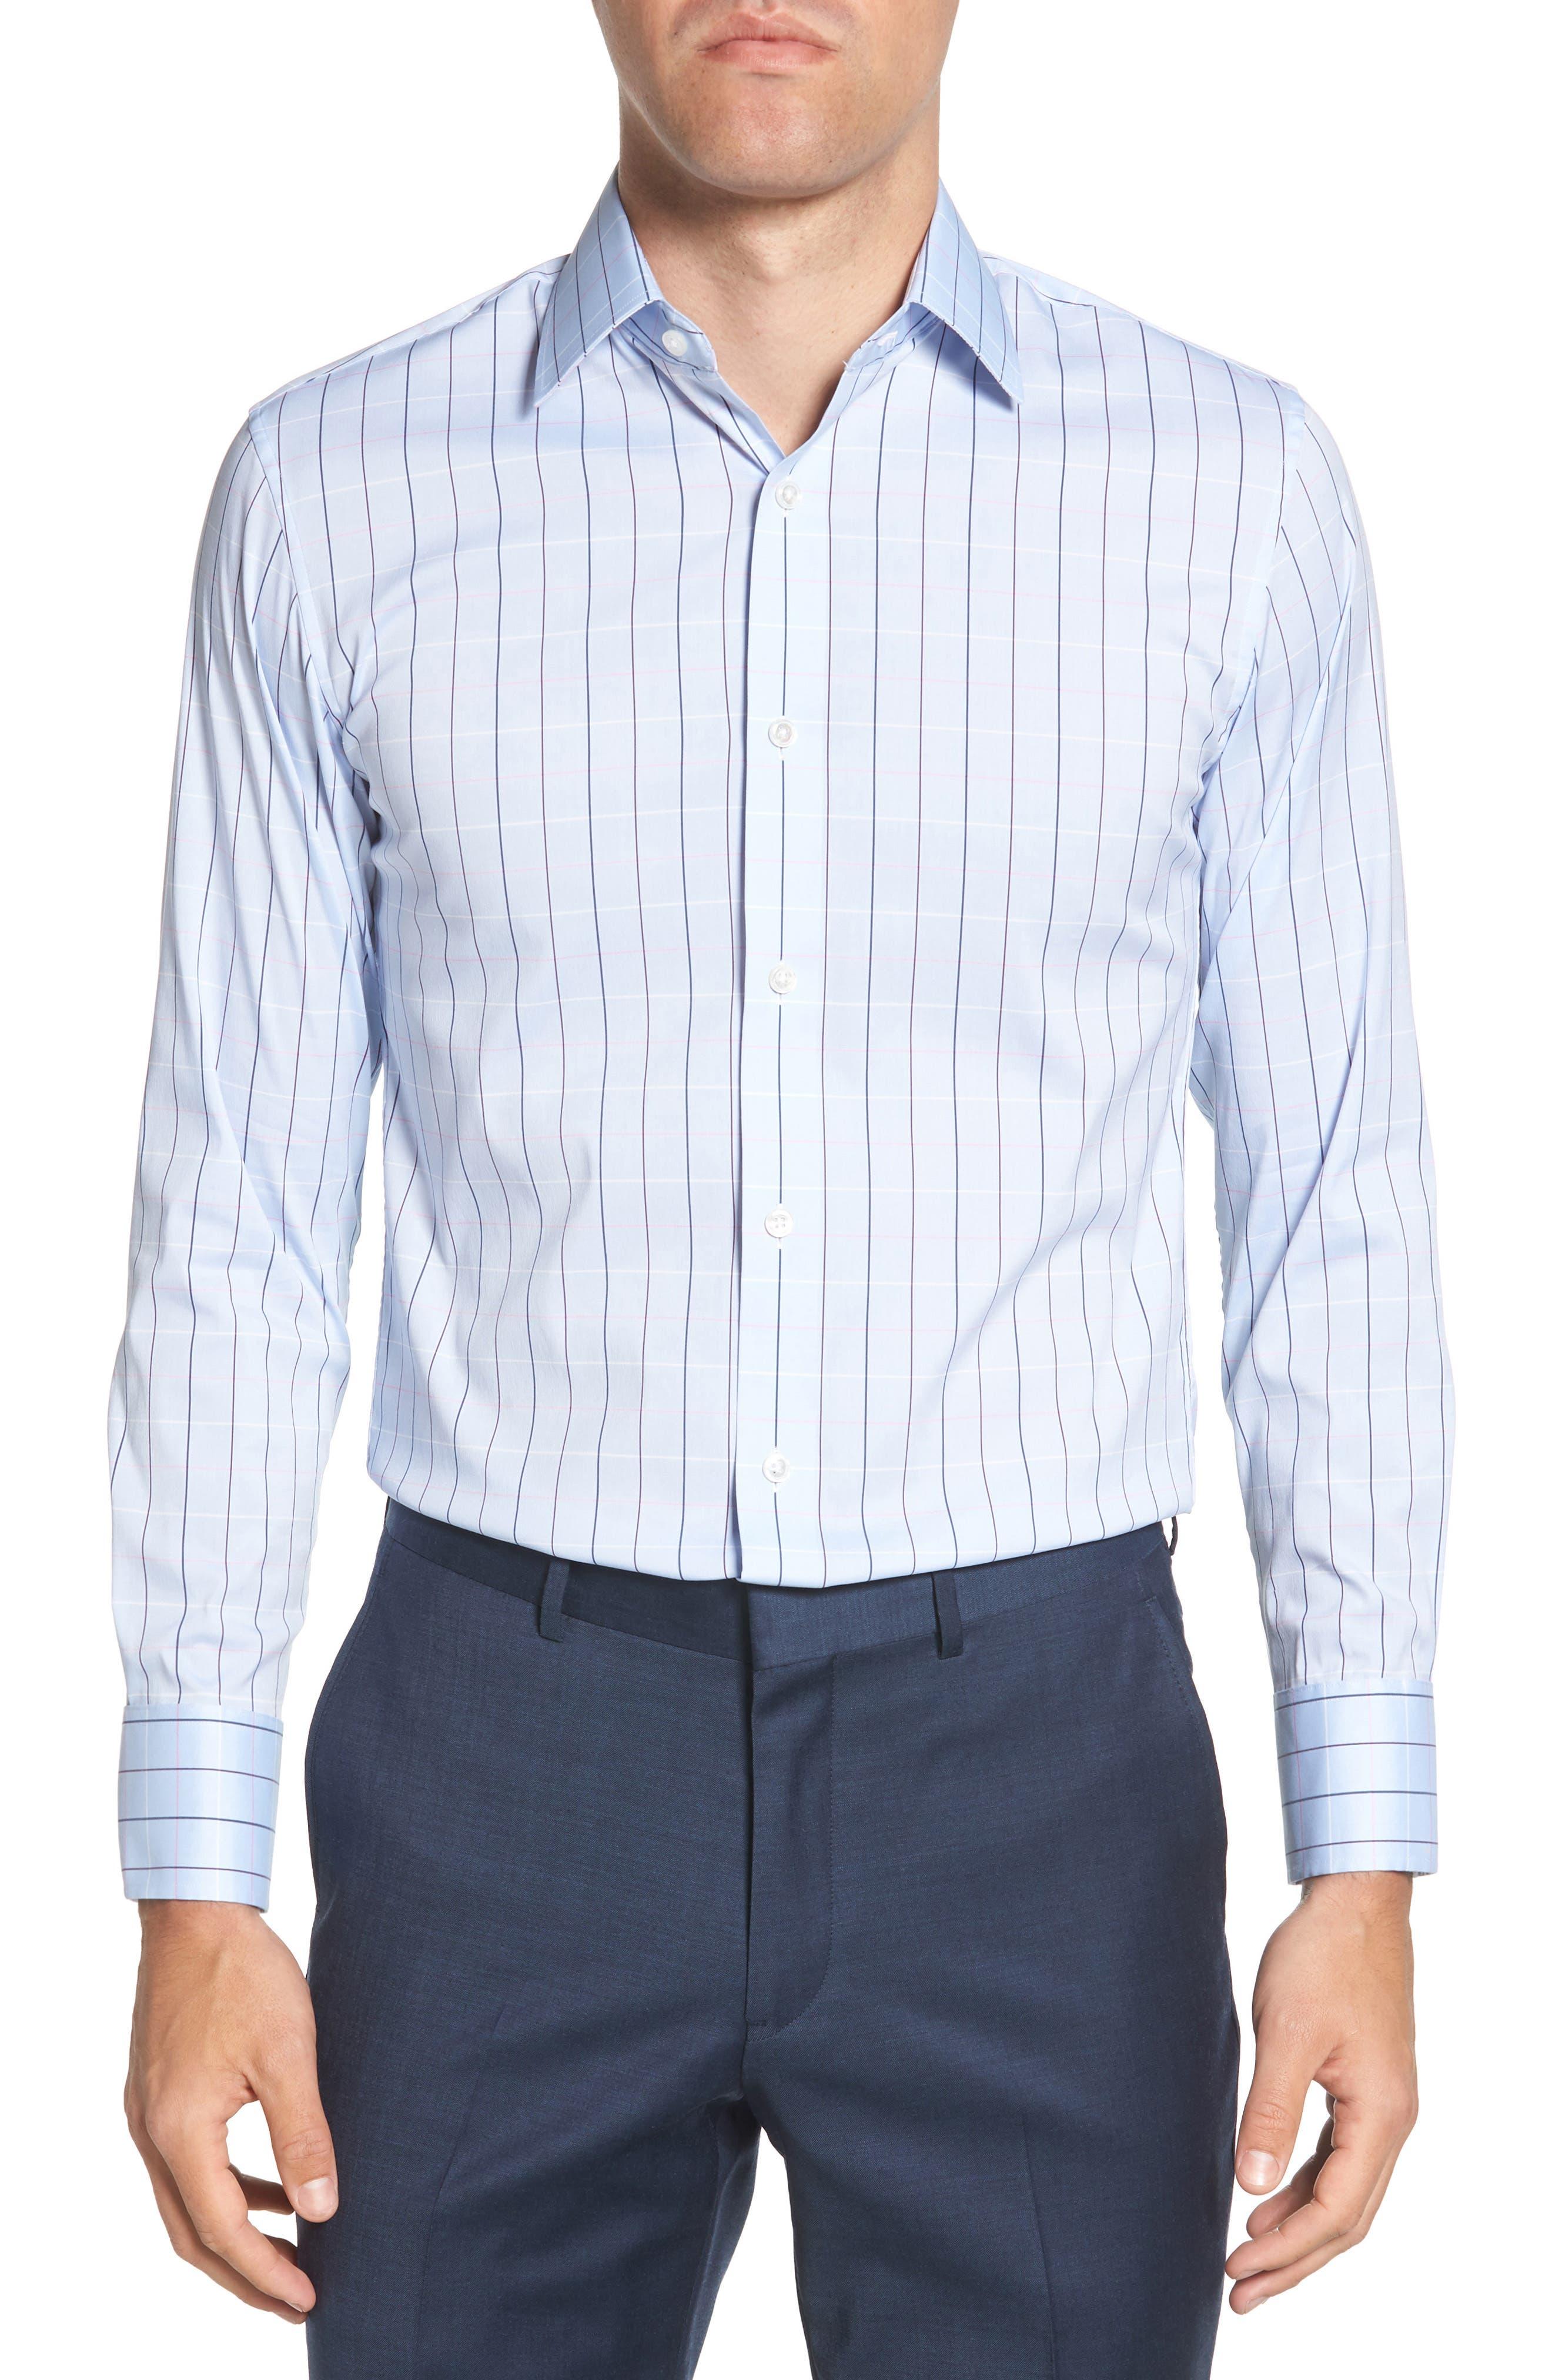 Jetsetter Slim Fit Stretch Check Dress Shirt,                         Main,                         color, 400